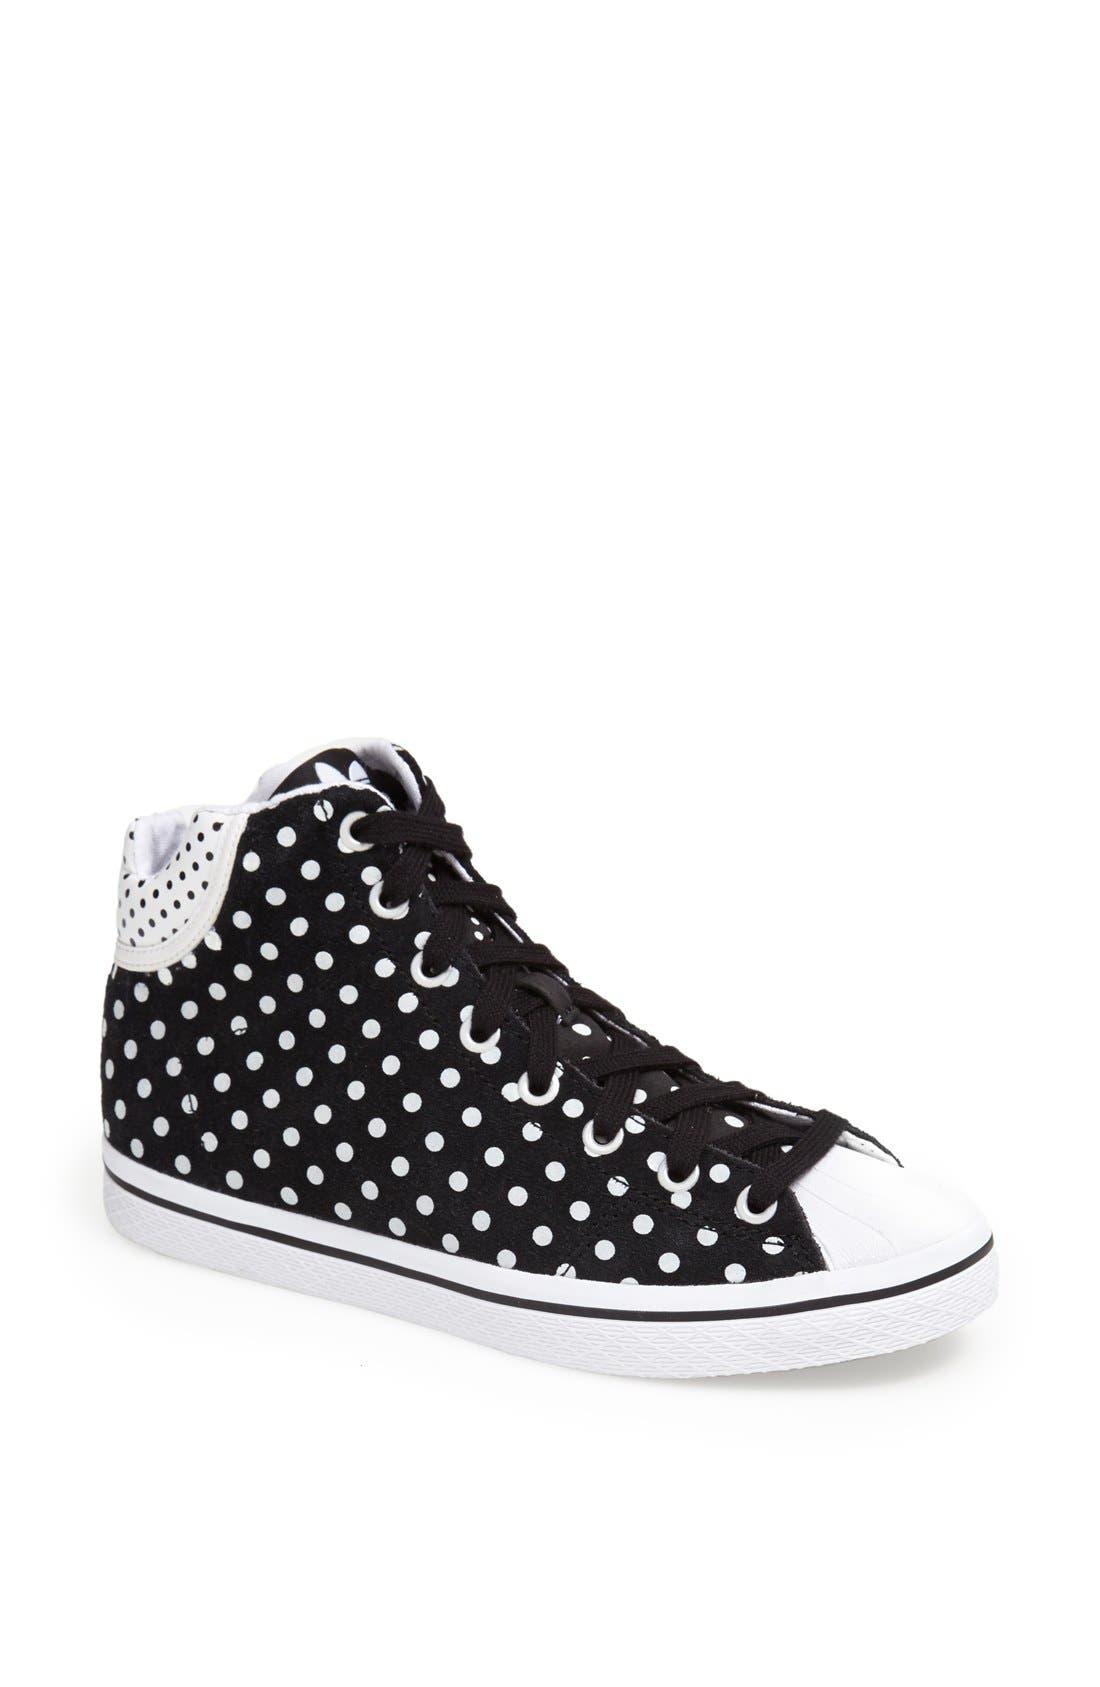 'Star' High Top Sneaker,                         Main,                         color, 001